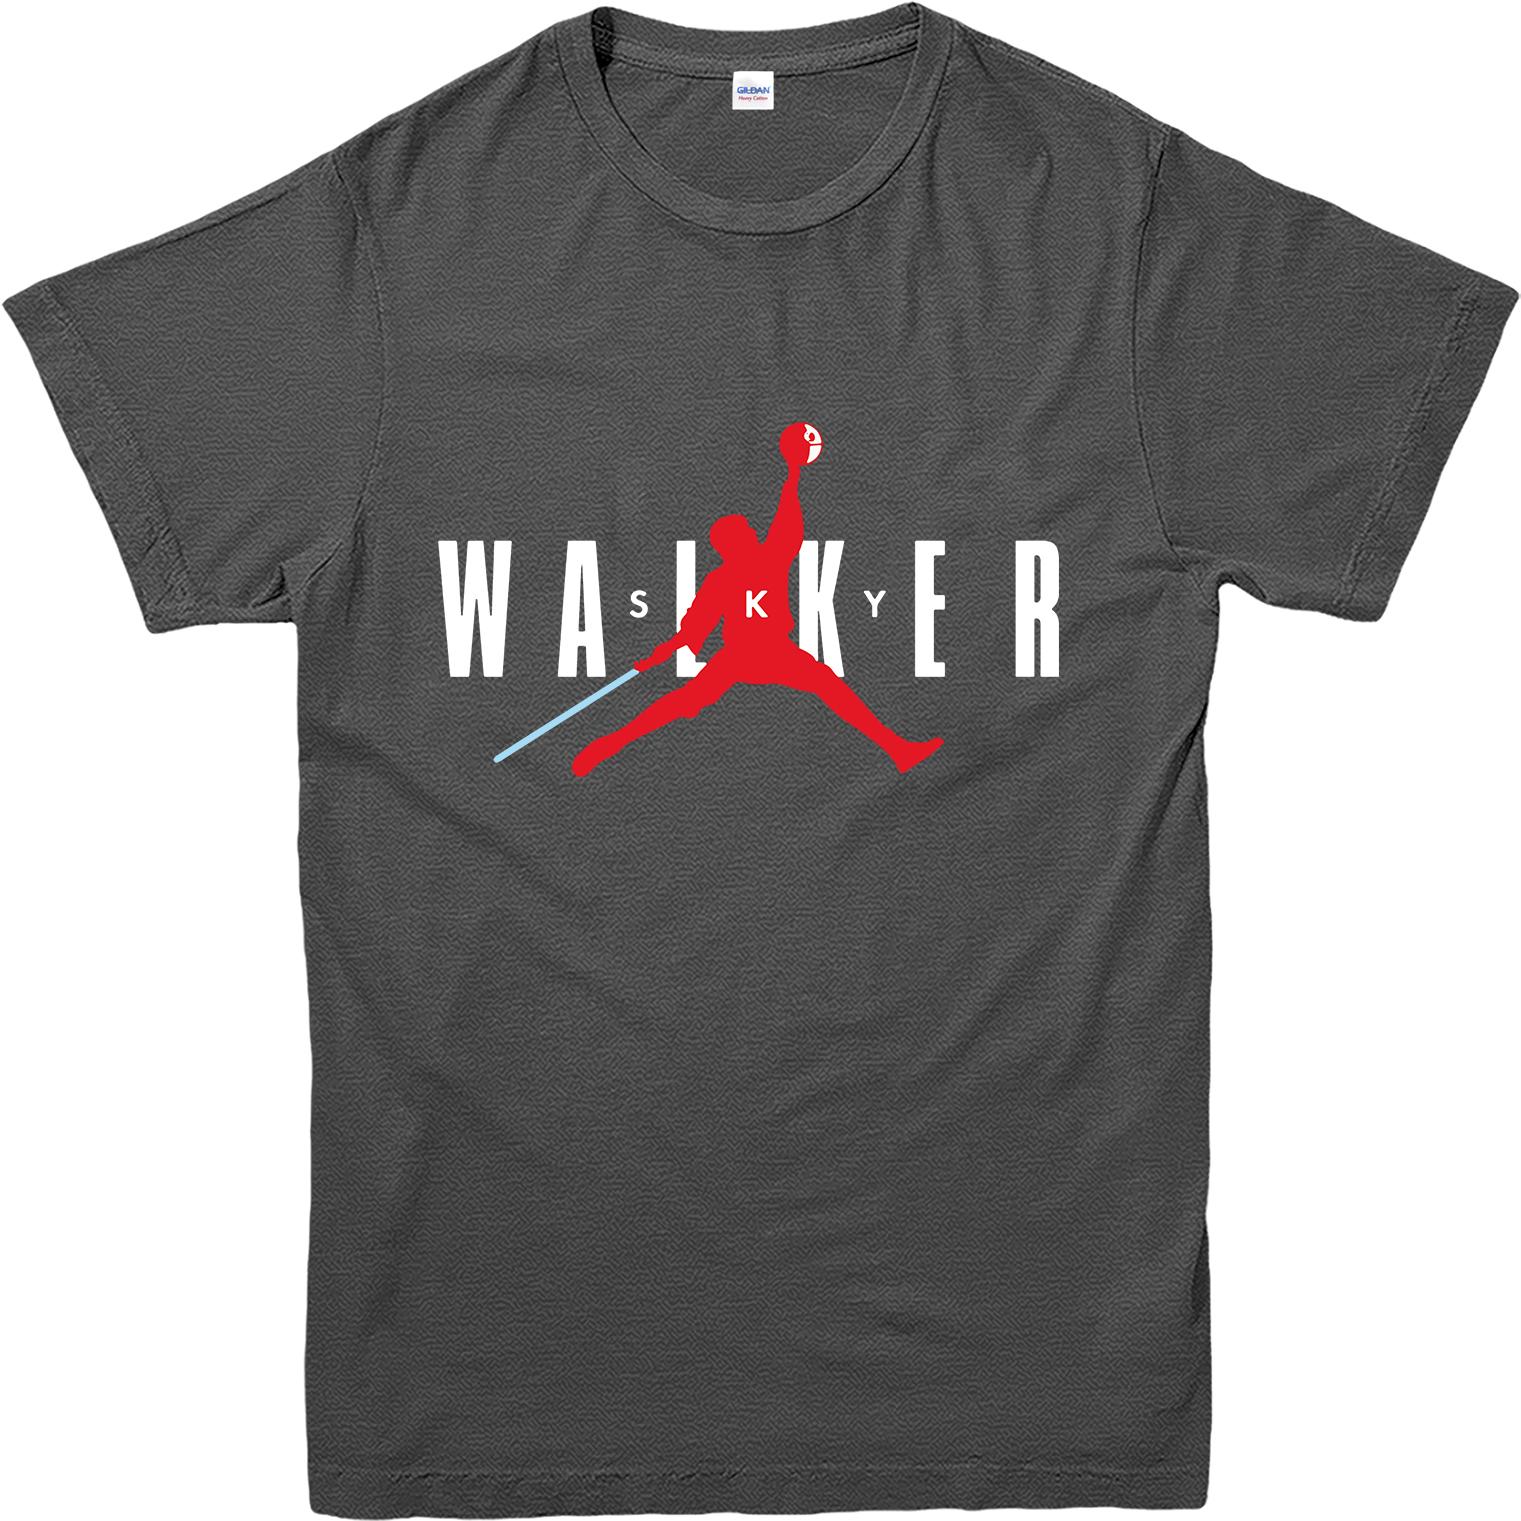 T shirt design jordan - Sky Walker T Shirt Jordan Logo Spoof T